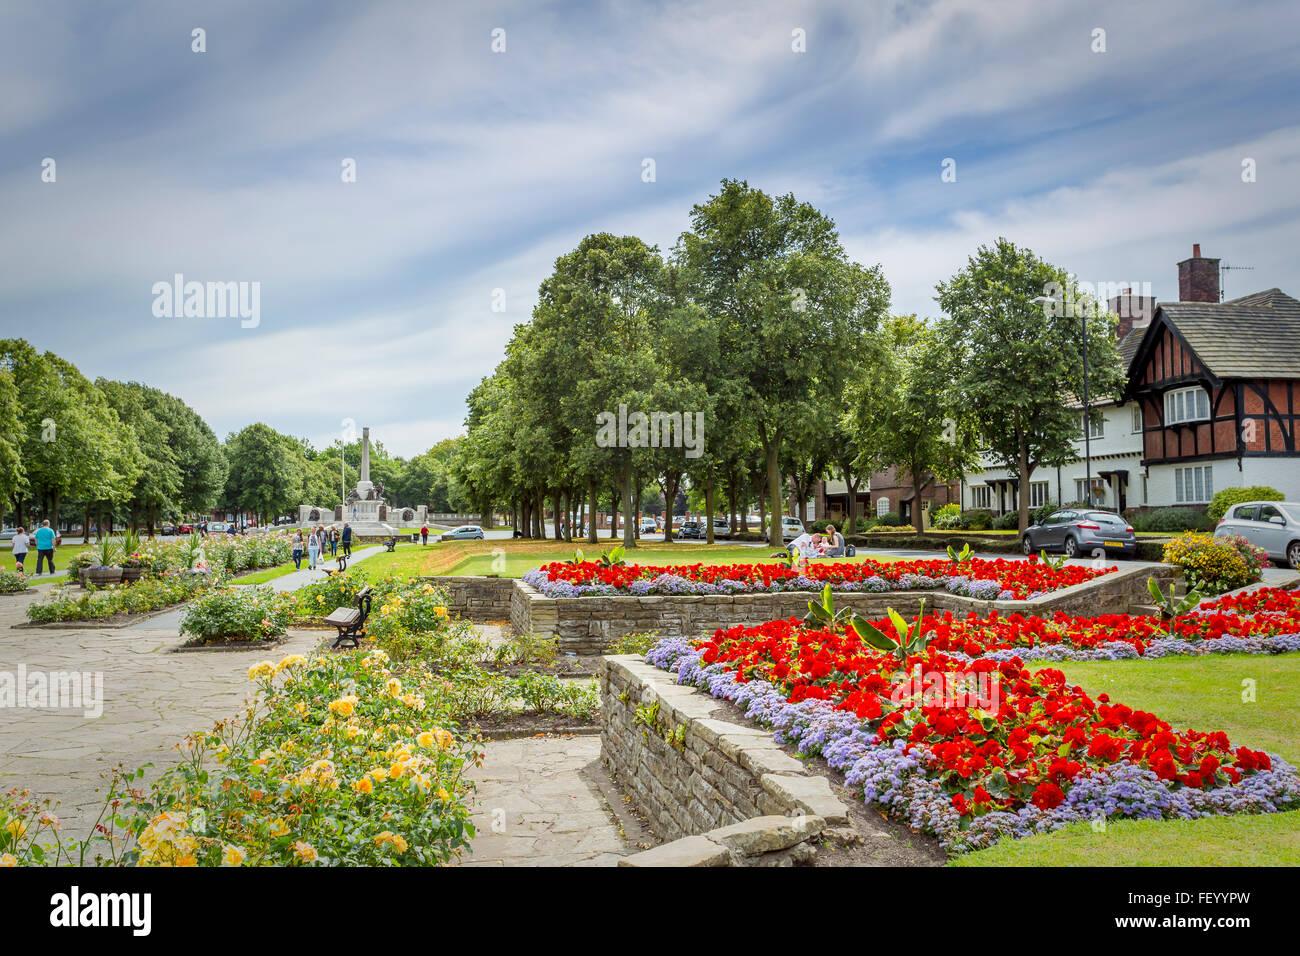 Spacious public gardens at Port Sunlight. - Stock Image